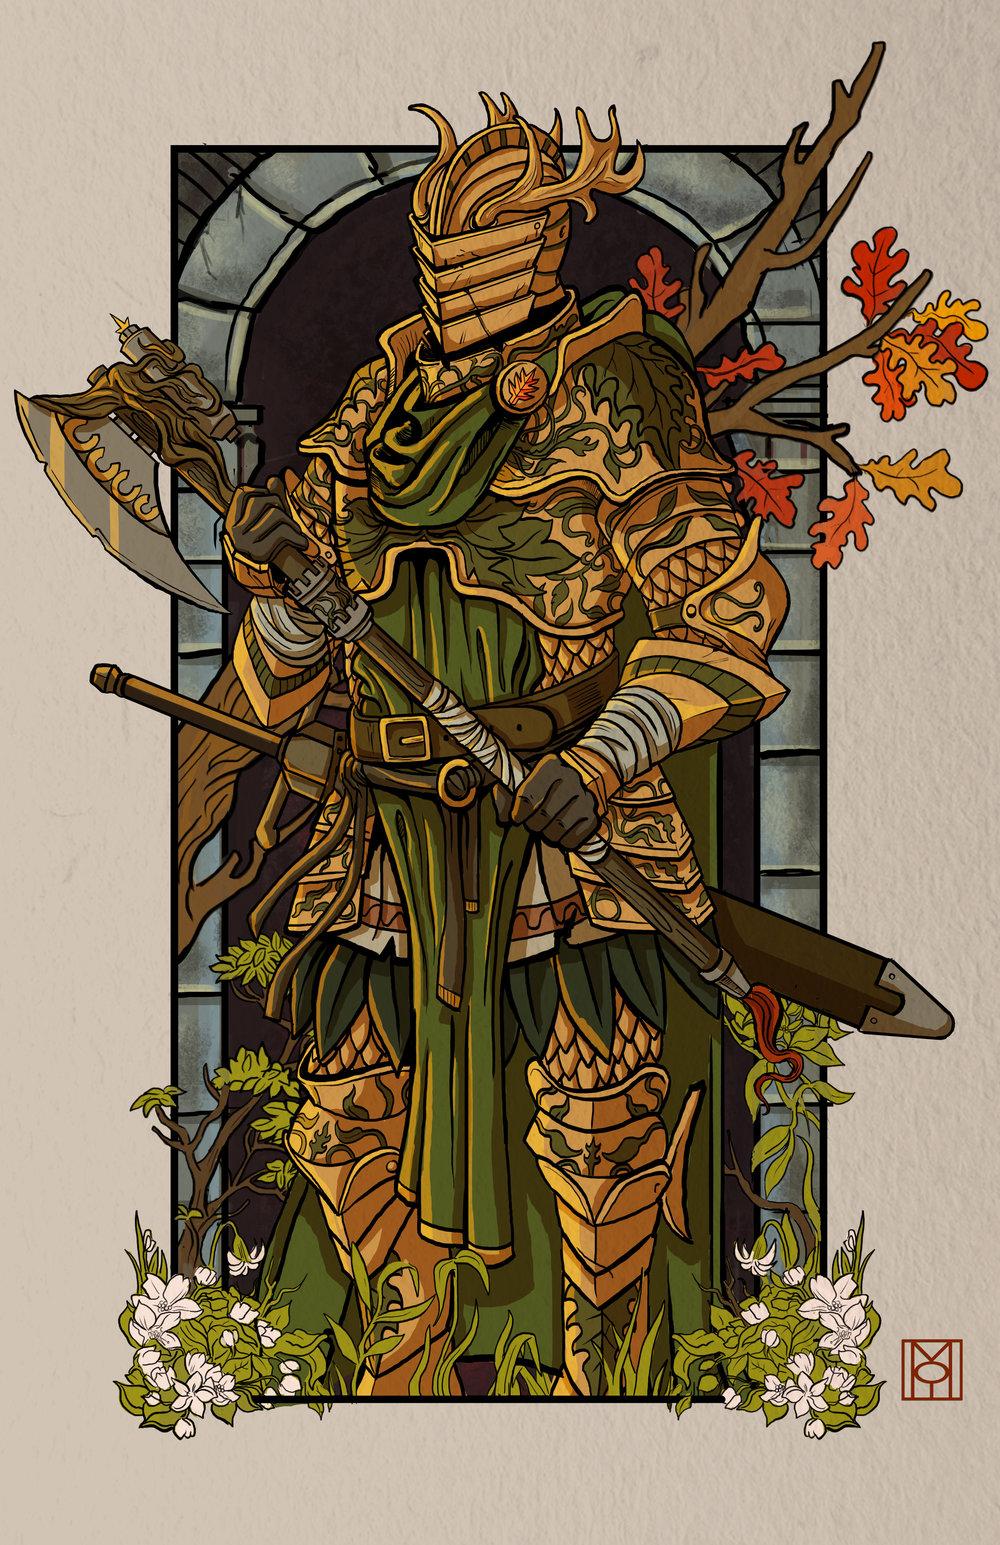 Bercilak: The Green Knight